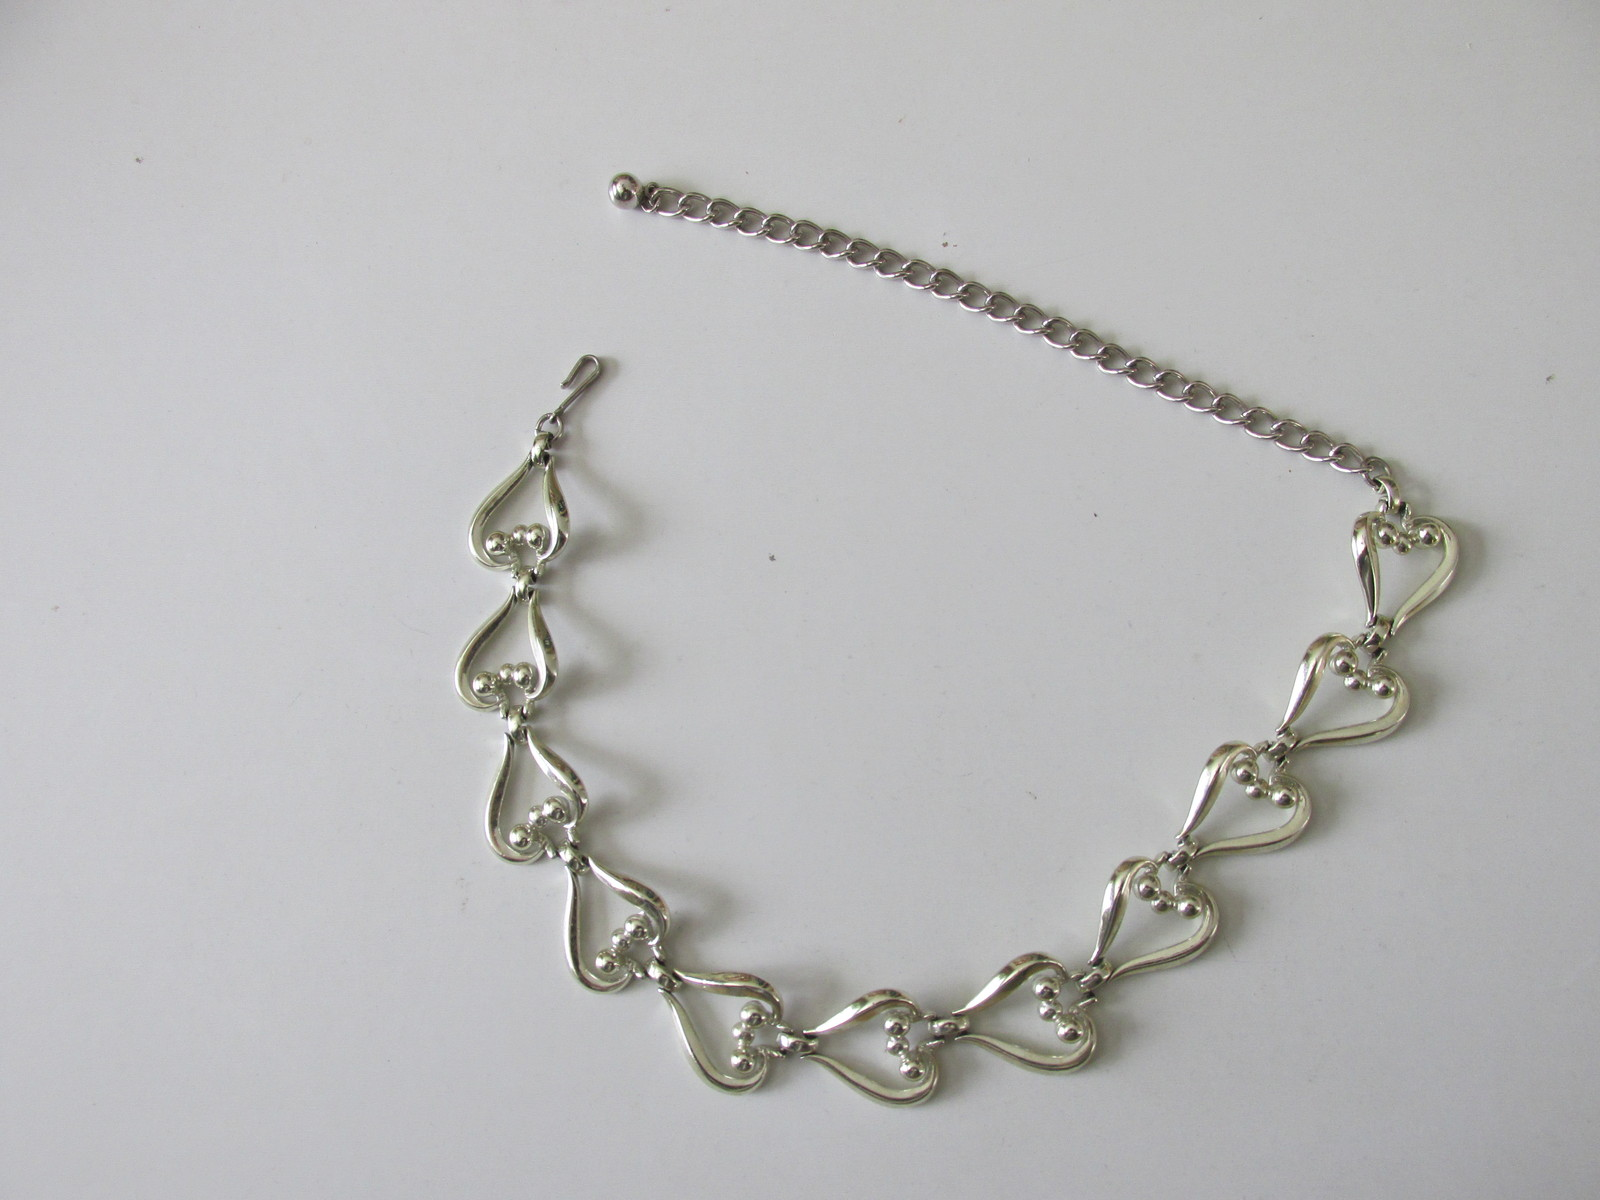 Retro / Vintage Coro Silver Toned Dressy Necklace / Choker